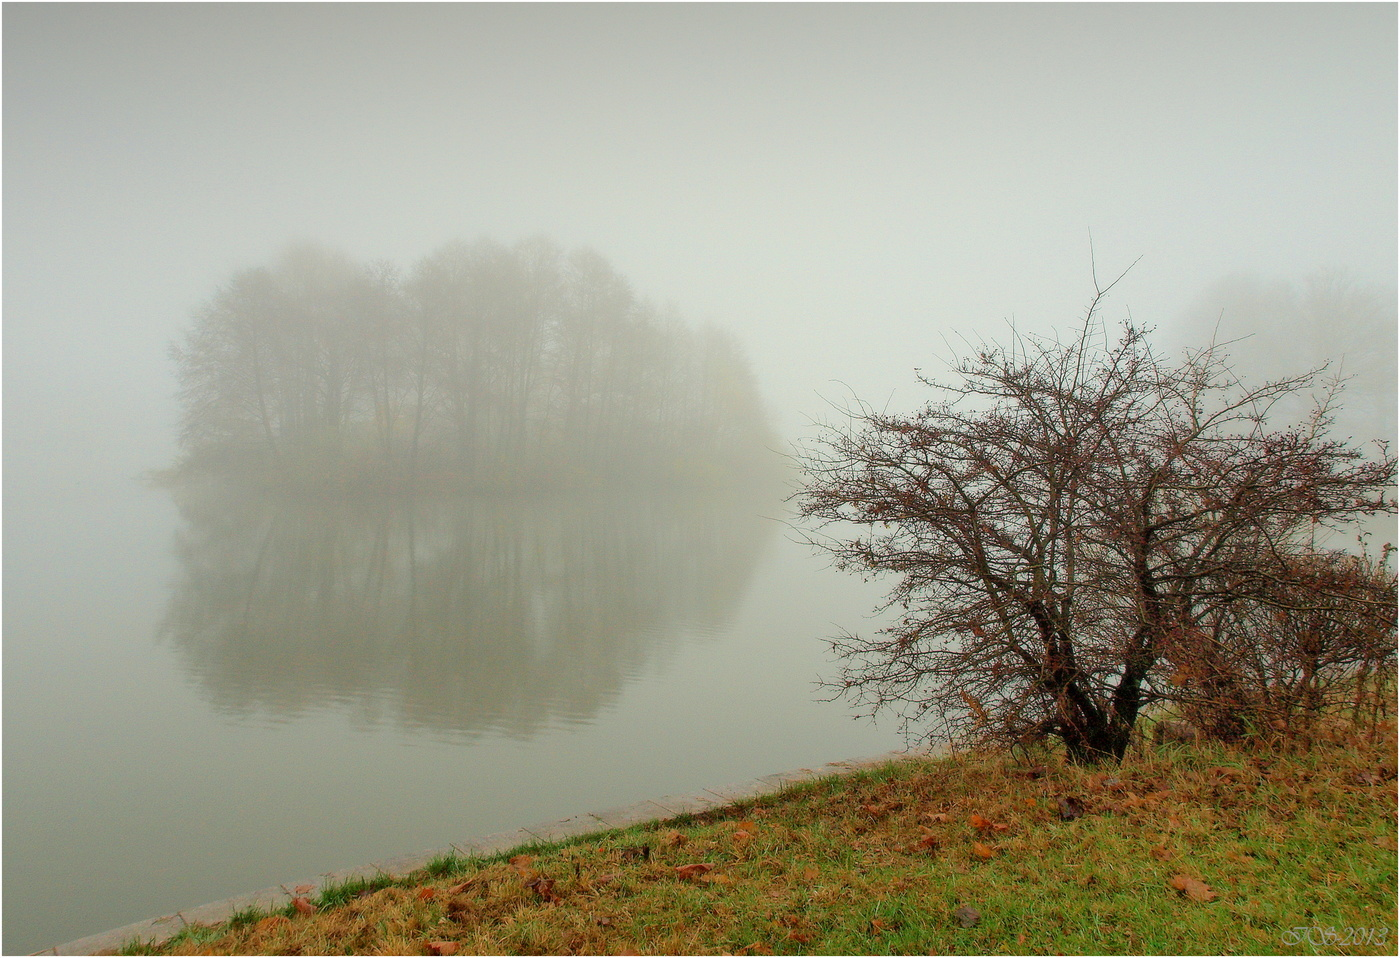 герцберг туман над рекой фото учитывать